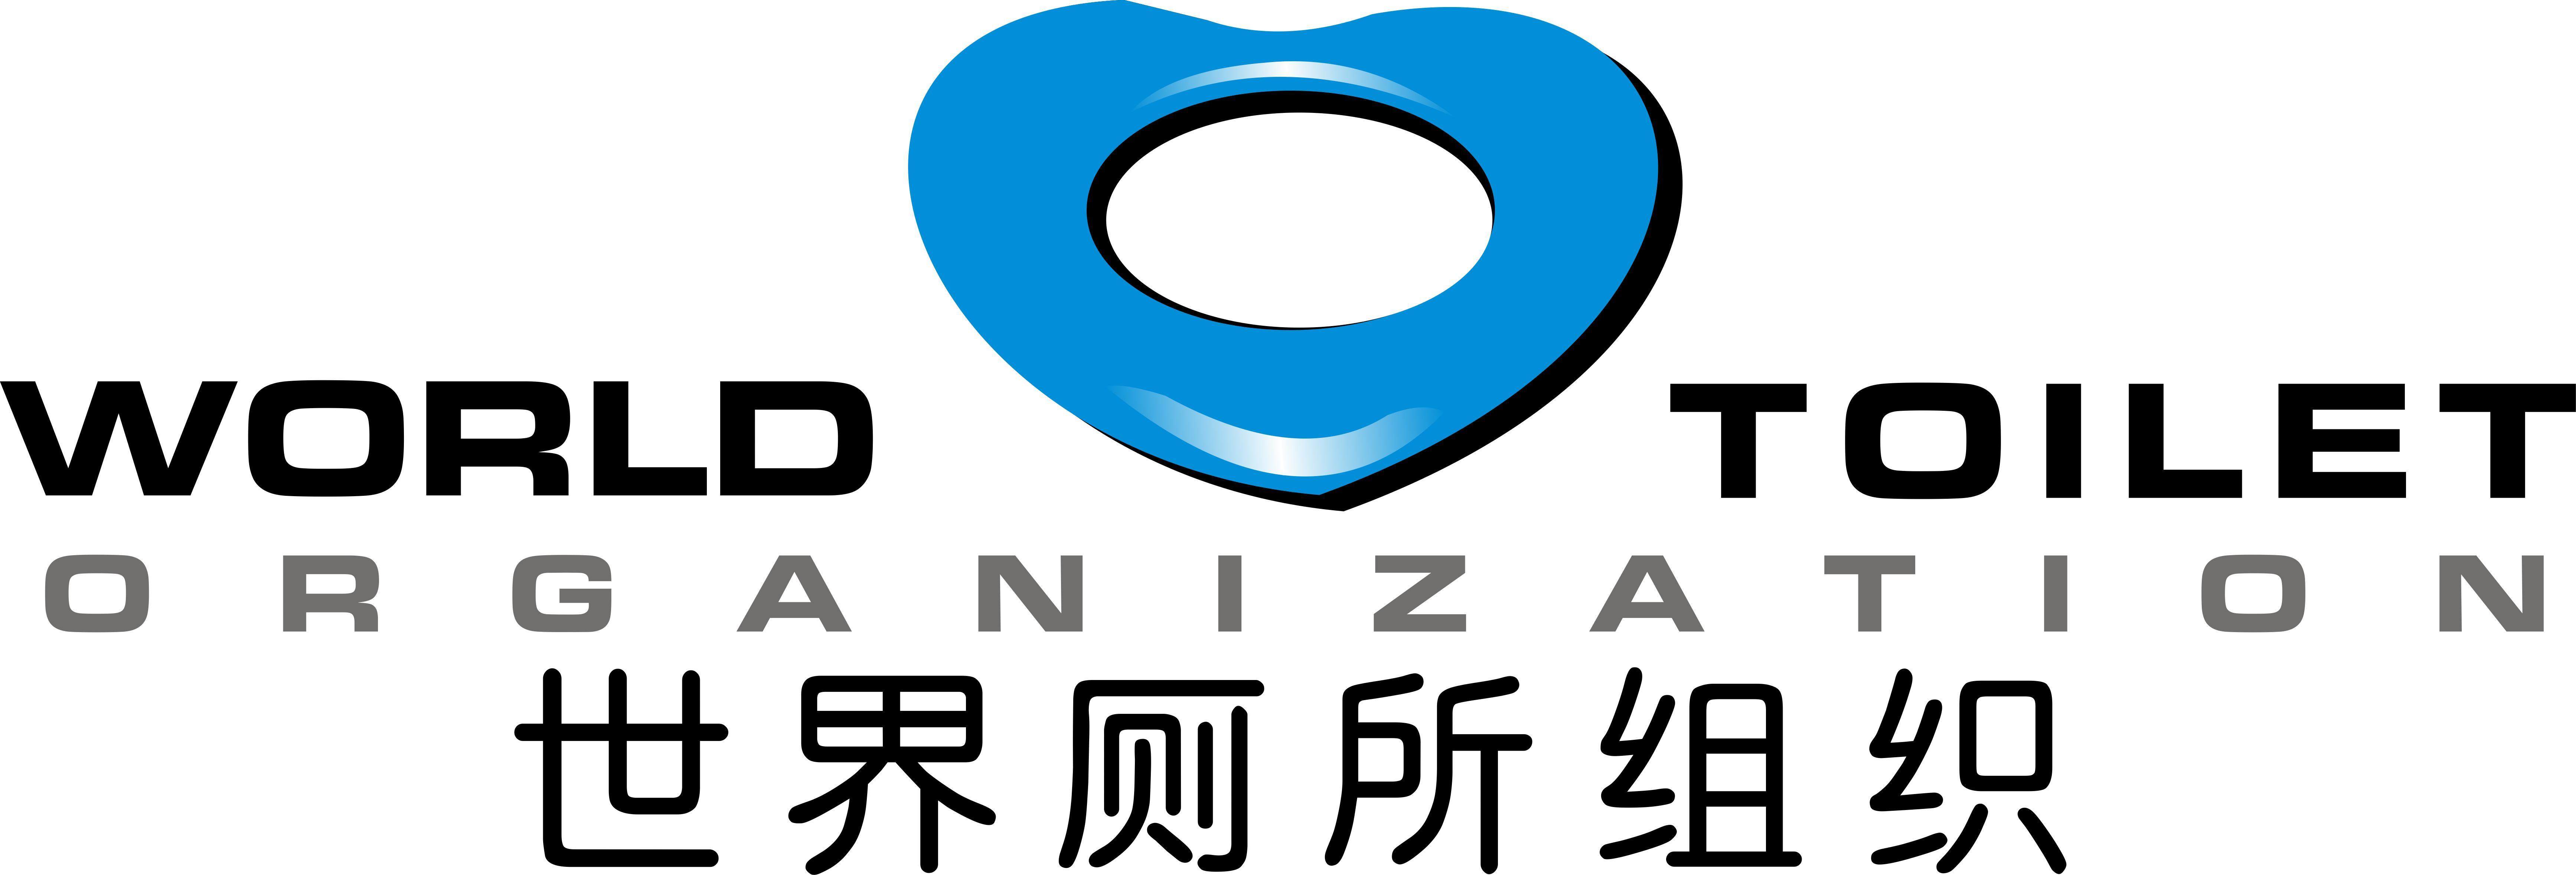 logo for World Toilet Organization